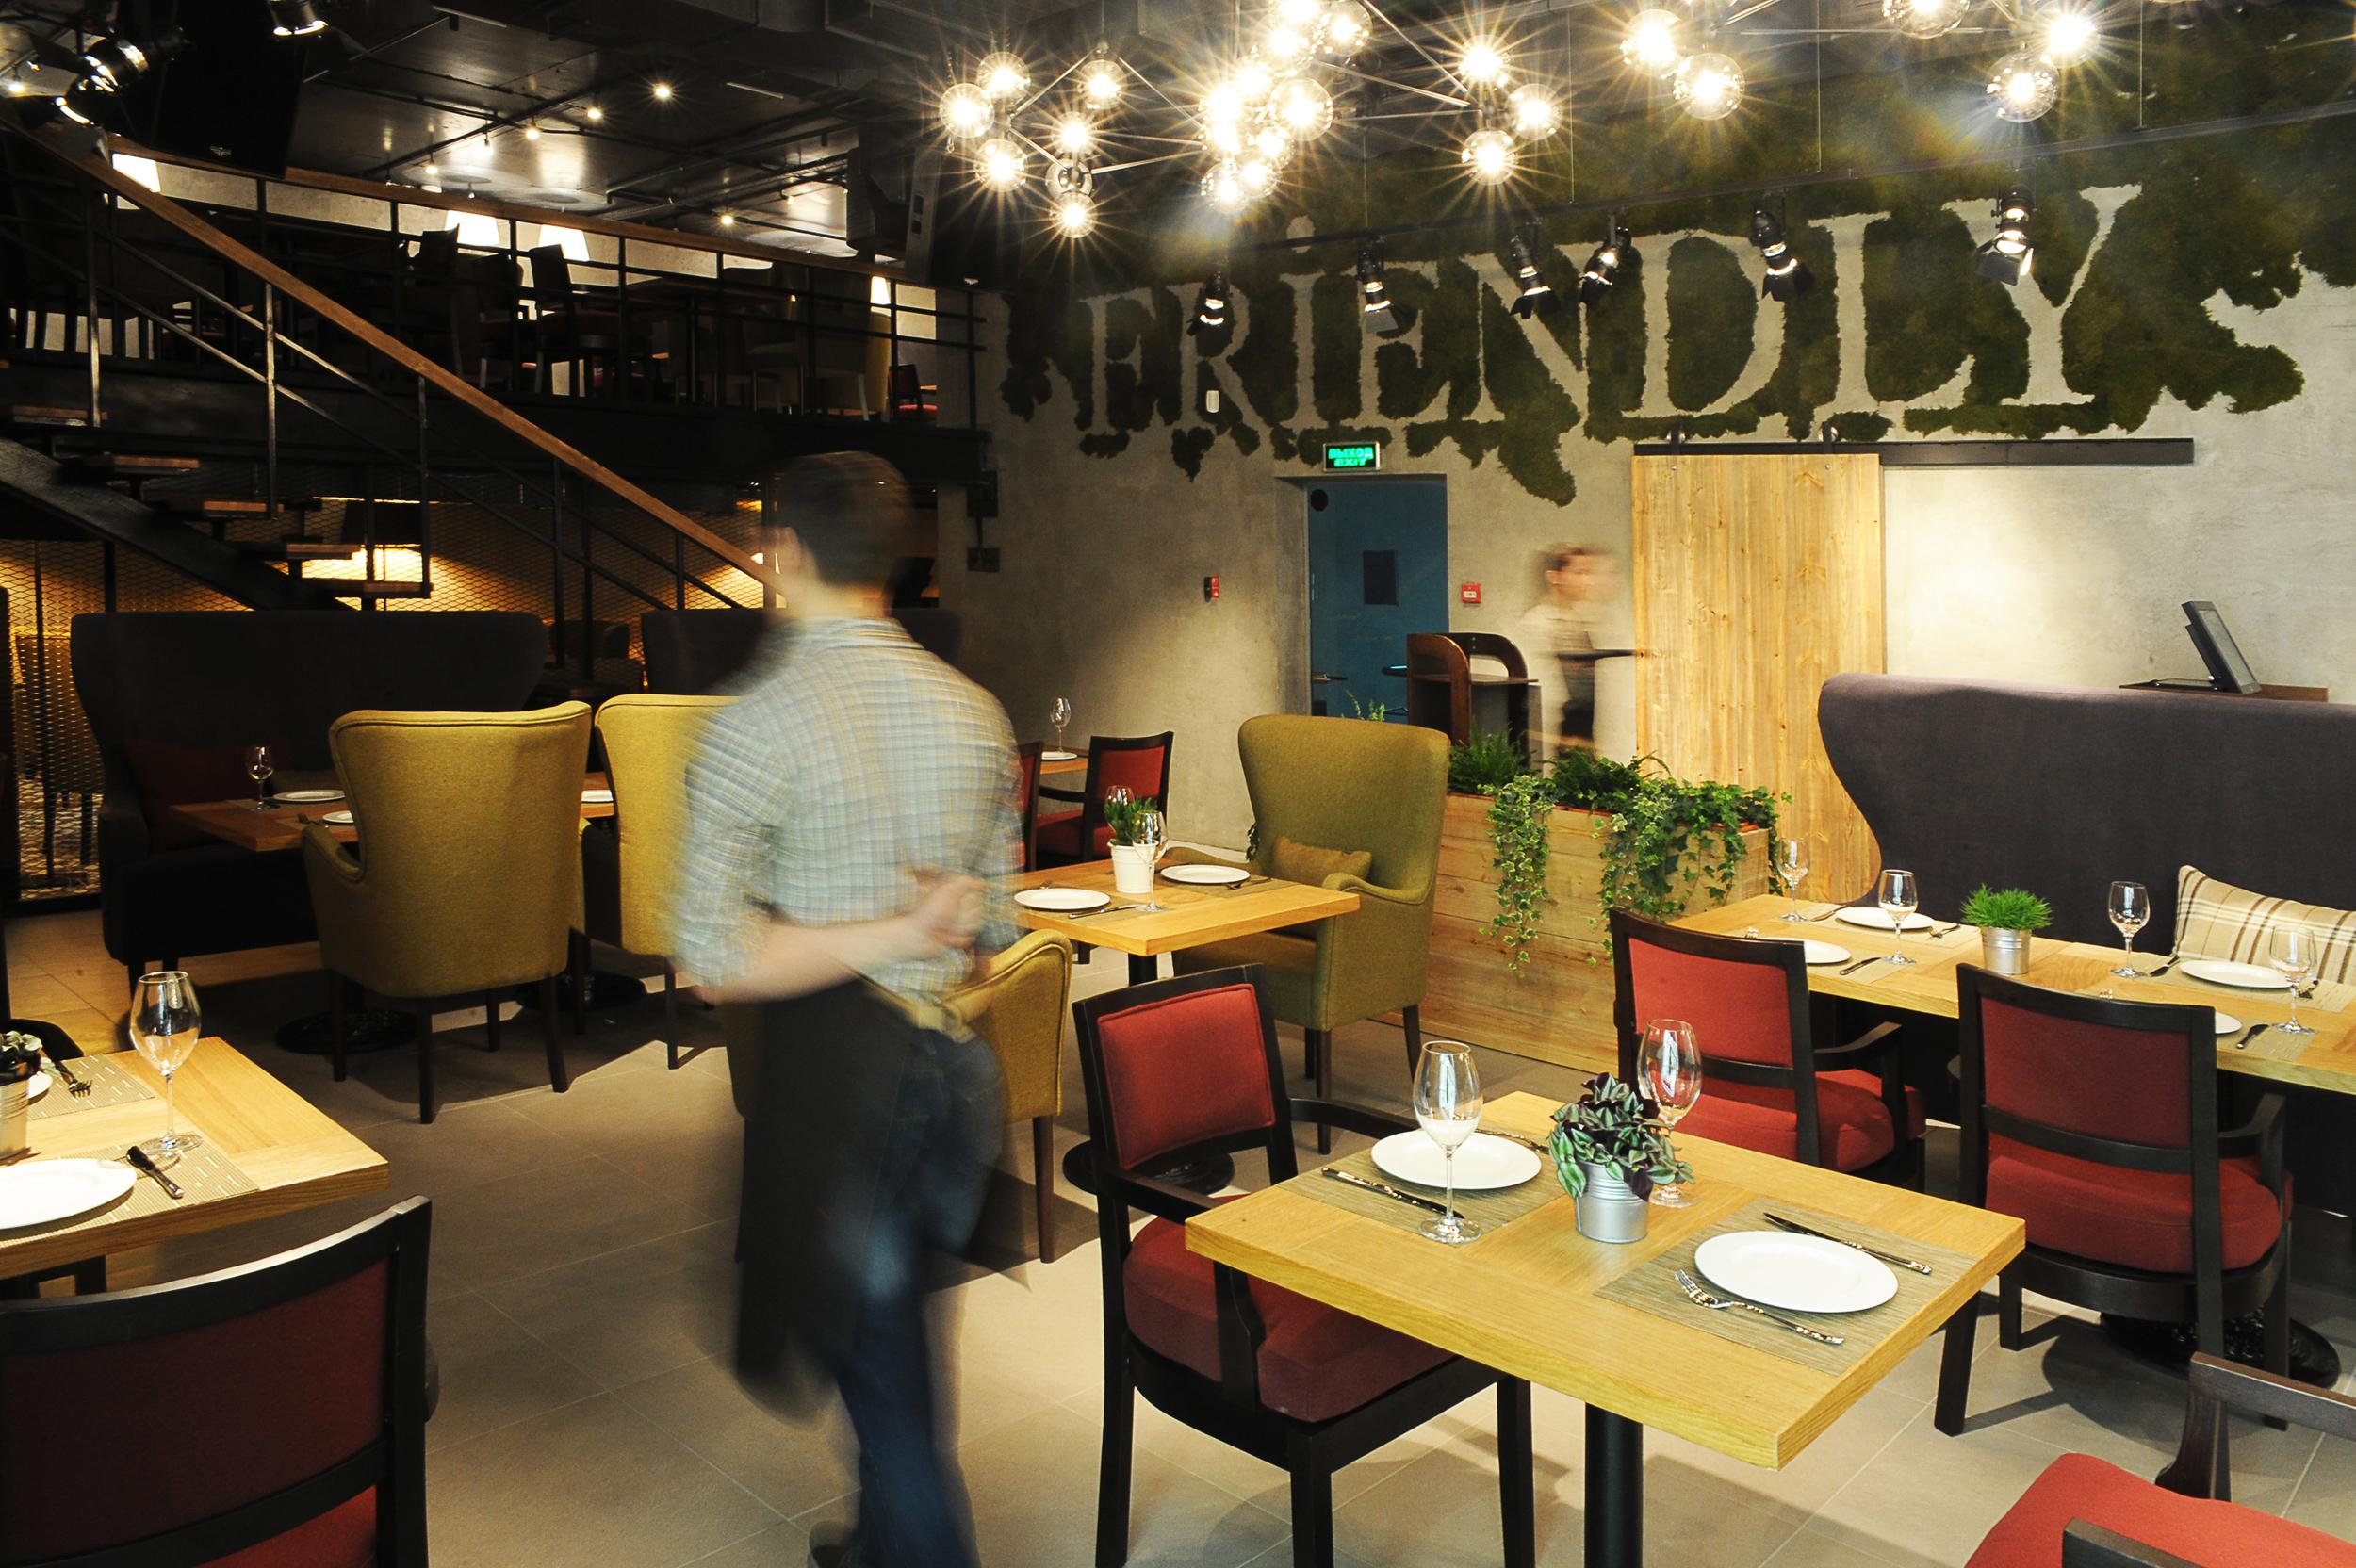 03_Match Architects_Friendly restaurant.jpg